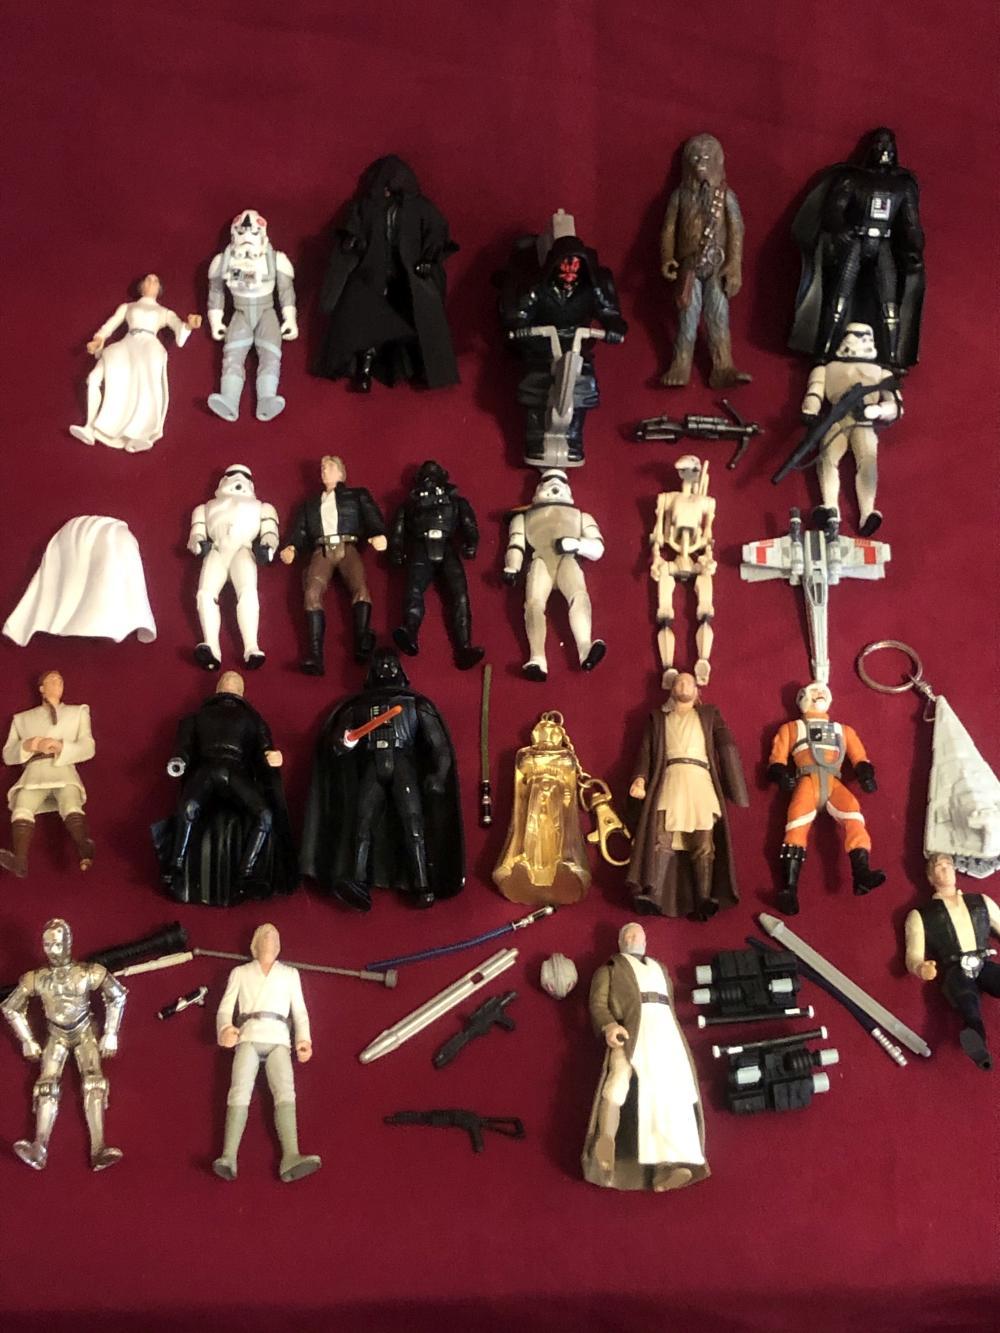 Star Wars figures & accessories - various years